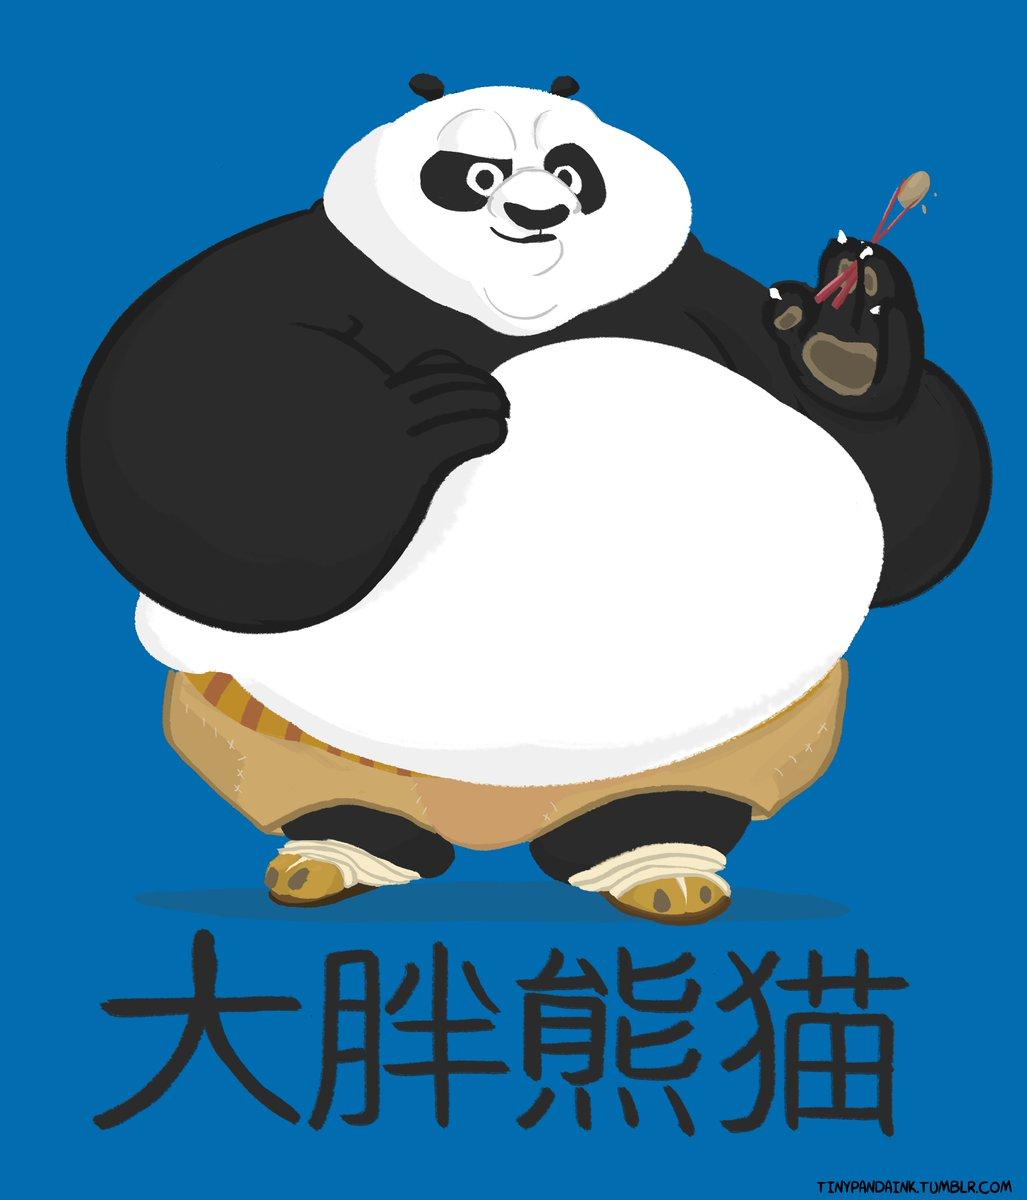 A Fat Pandanwich On Twitter He S The Big Fat Panda Po I M Very